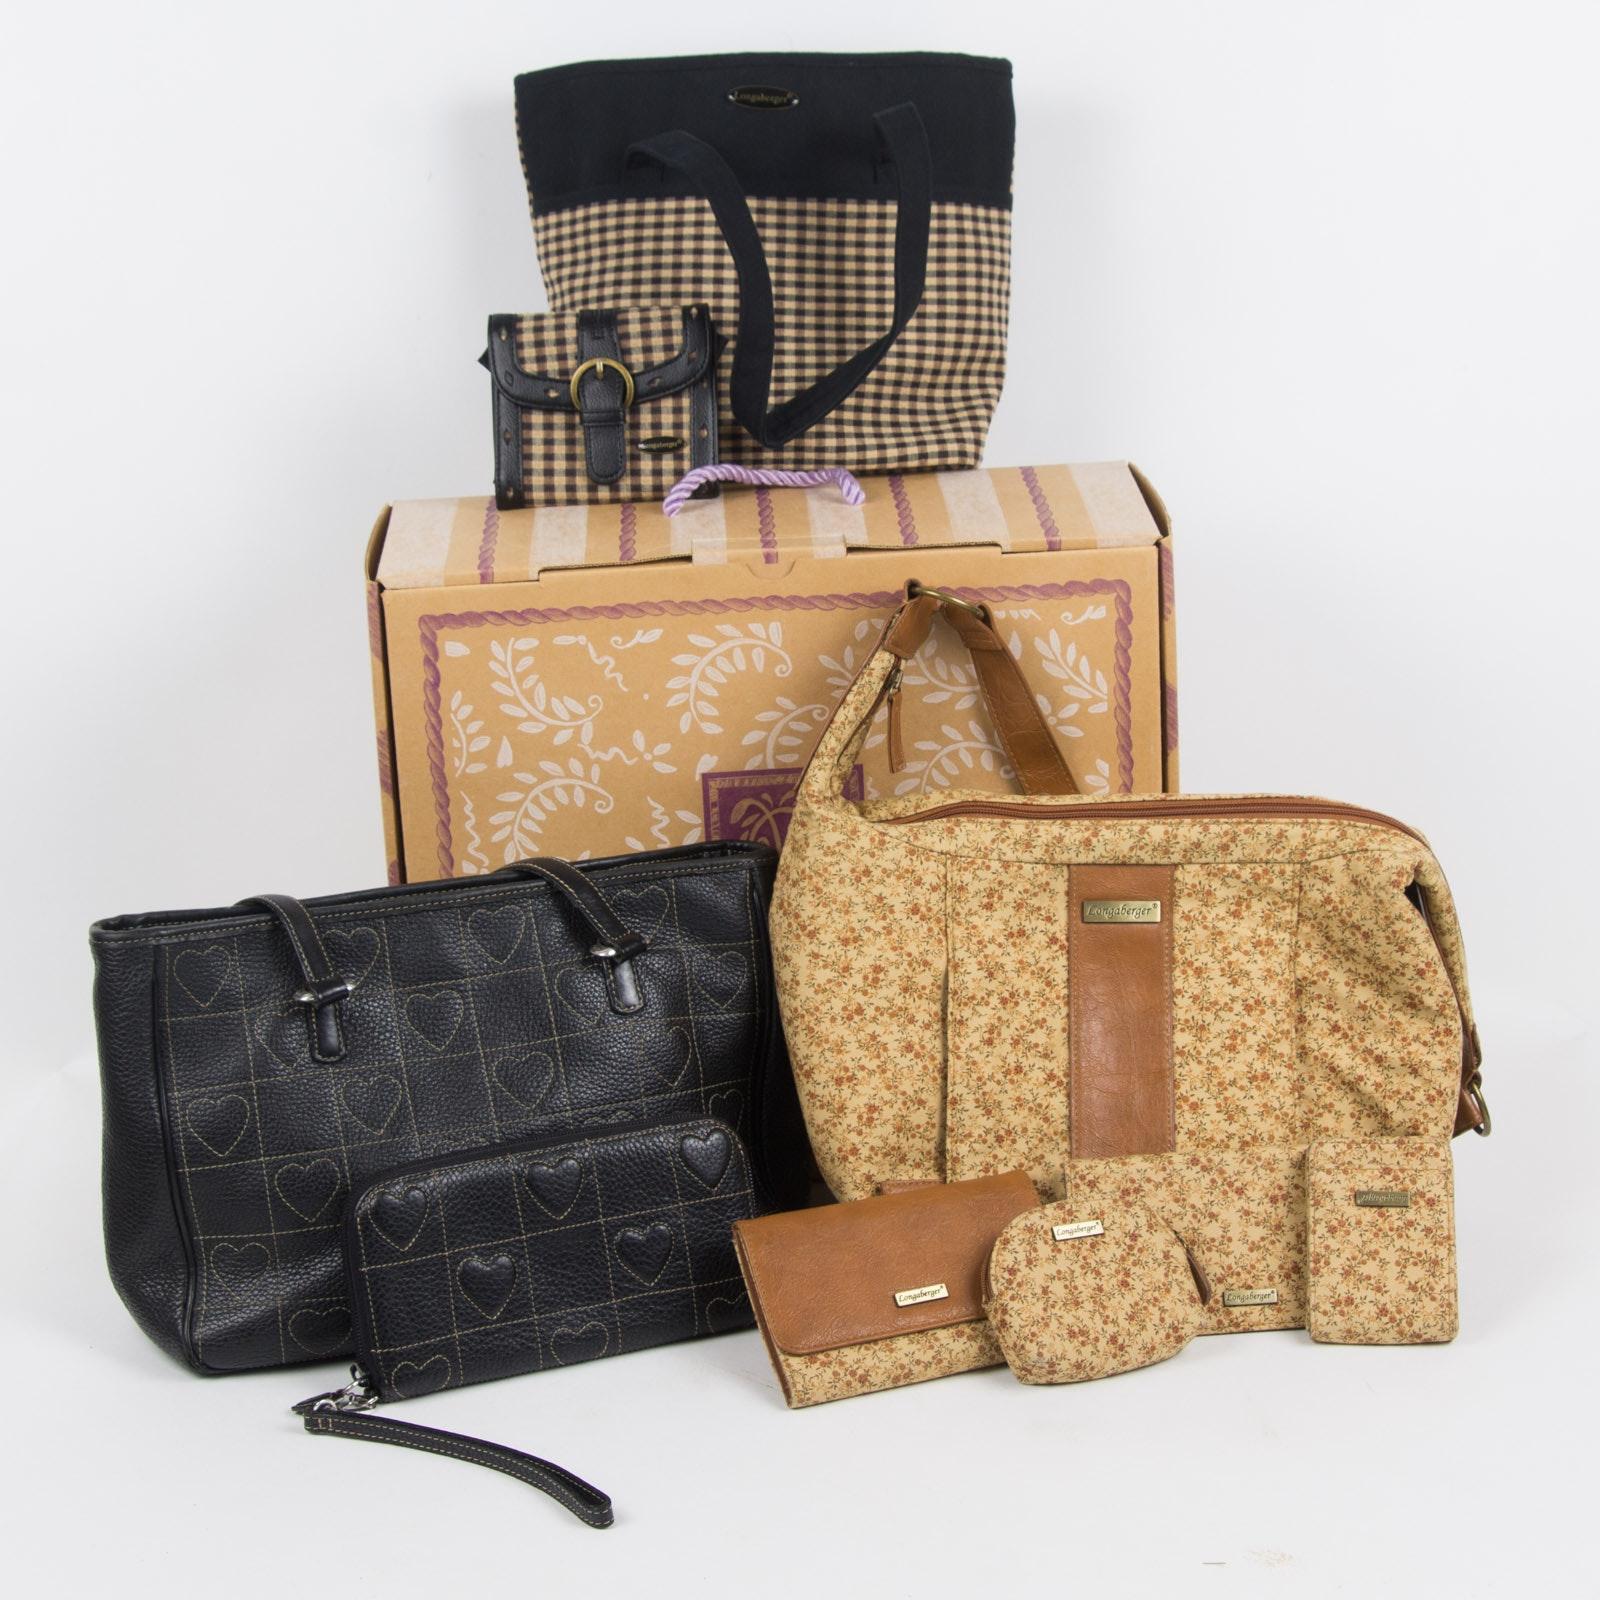 Brighton and Longaberger Handbags